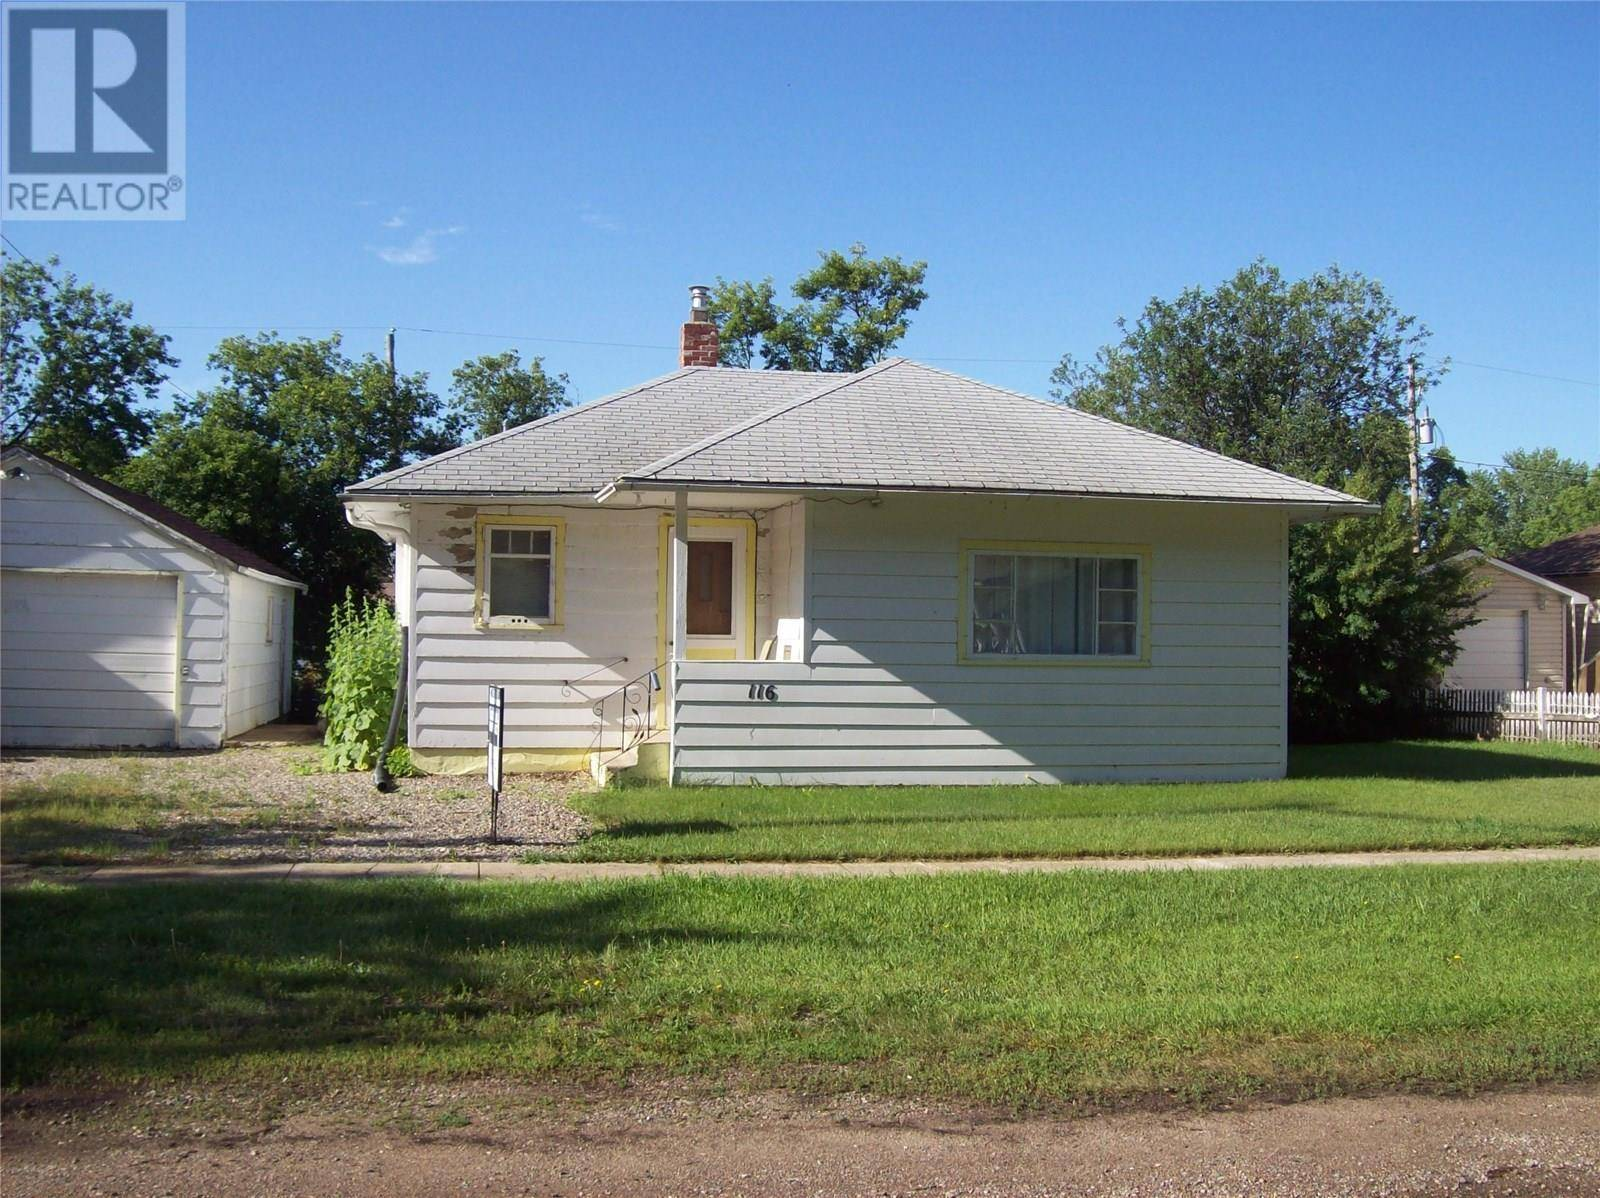 House for sale at 116 2nd St E Langham Saskatchewan - MLS: SK776316